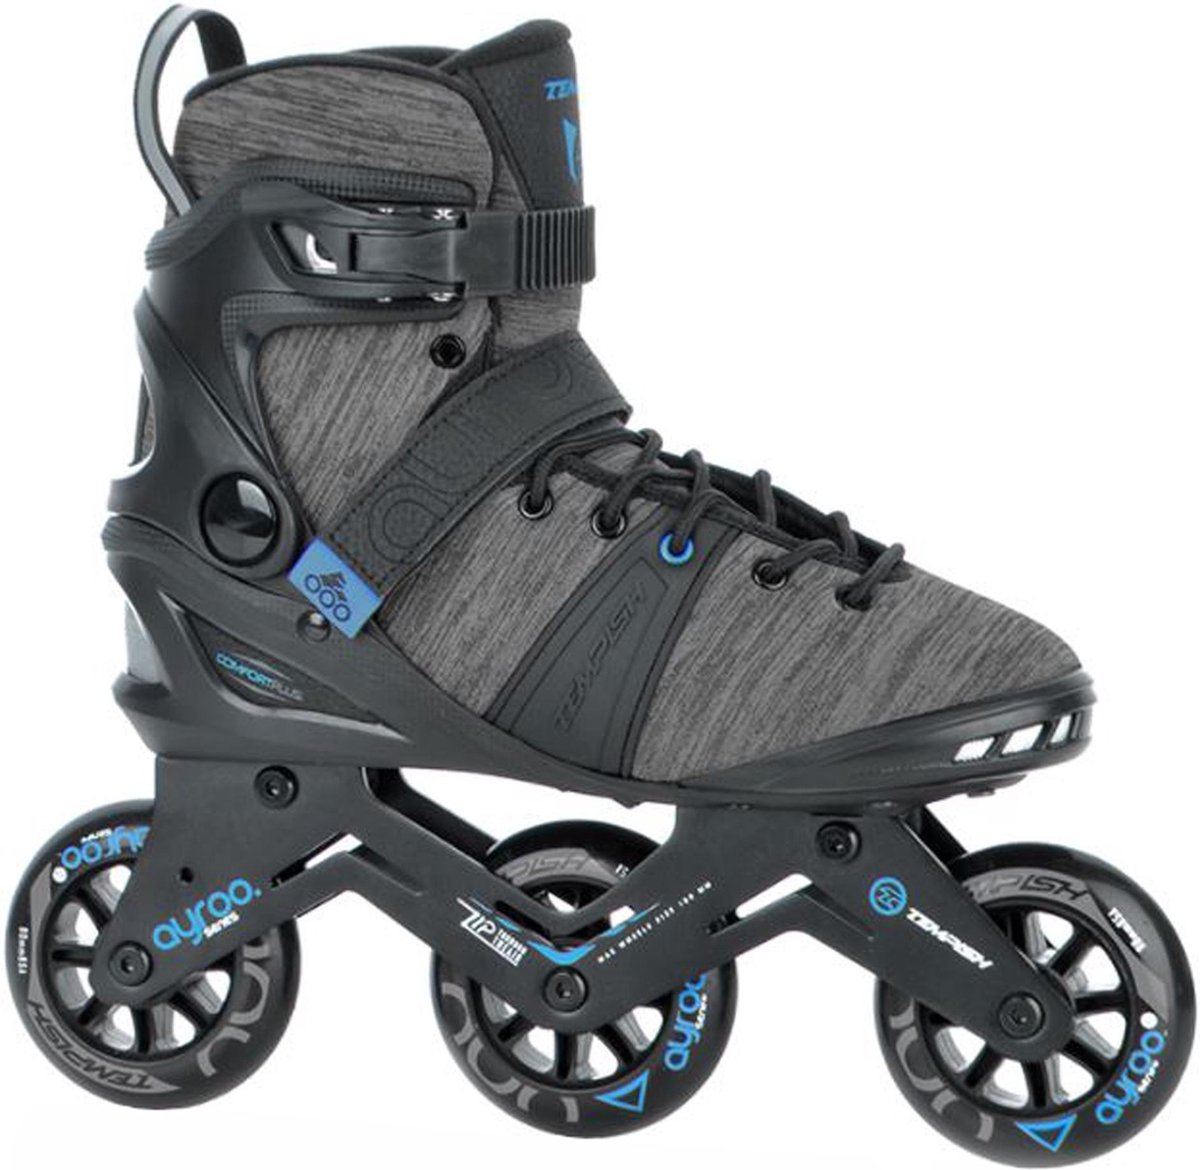 Tempish Ayroo 90 Inlineskates - Maat 39 - Unisex - zwart - grijs - blauw